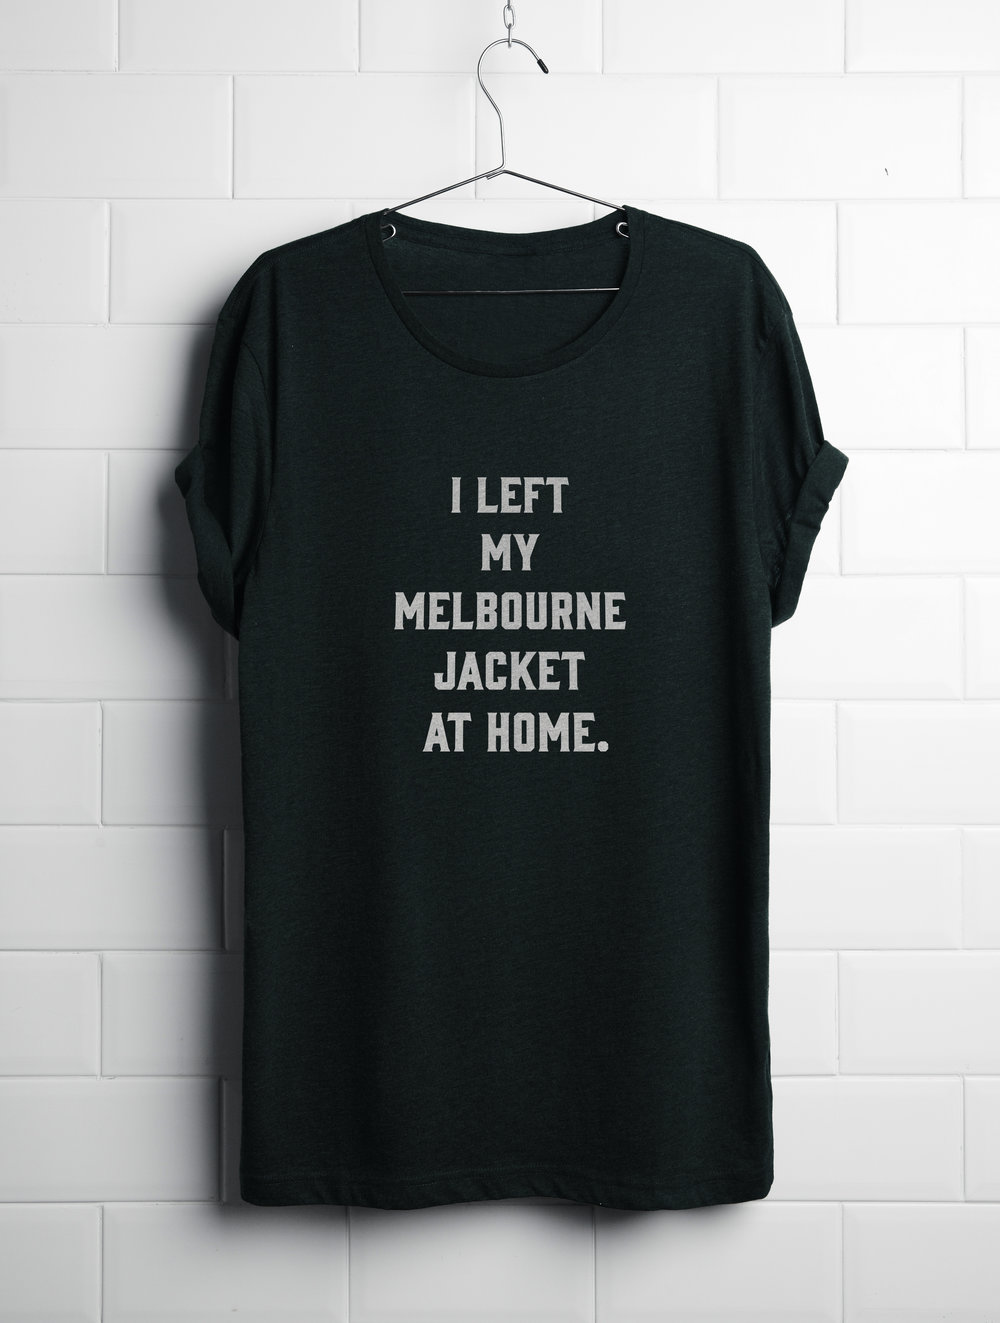 Melbourne Jacket t-shirt reward.